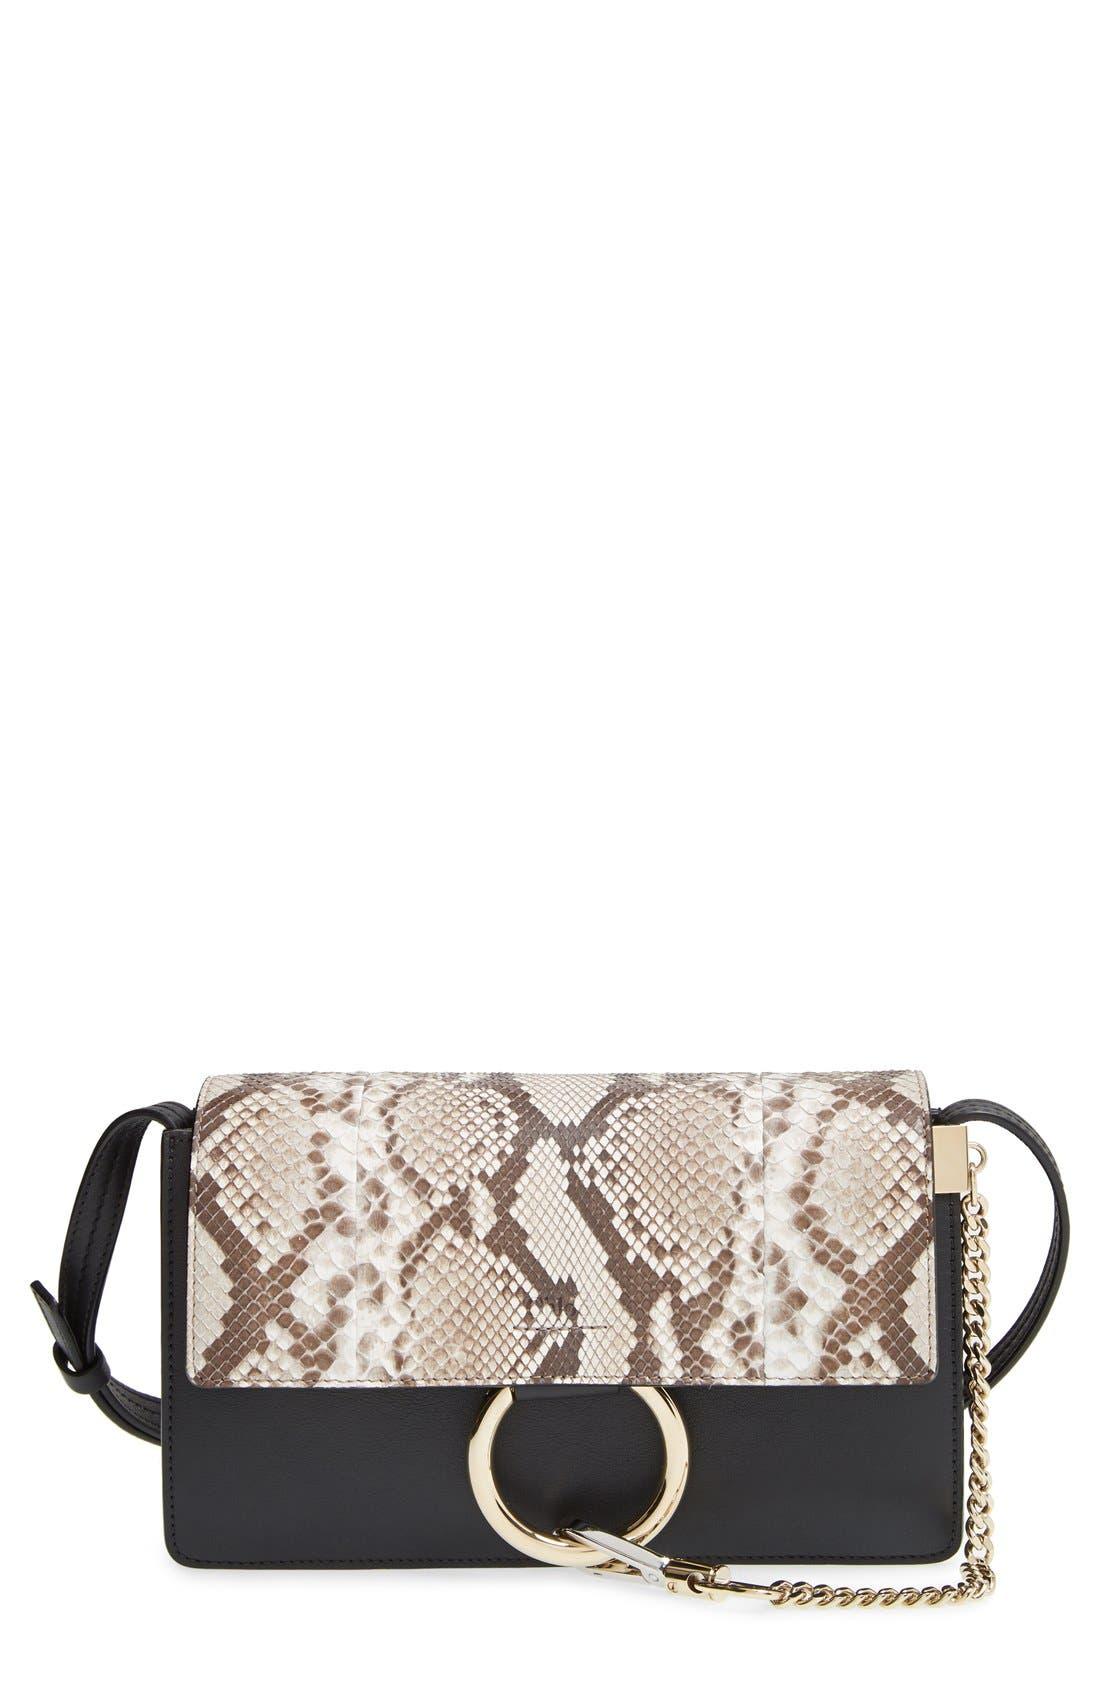 Main Image - Chloé 'Small Faye' Genuine Python & Leather Shoulder Bag